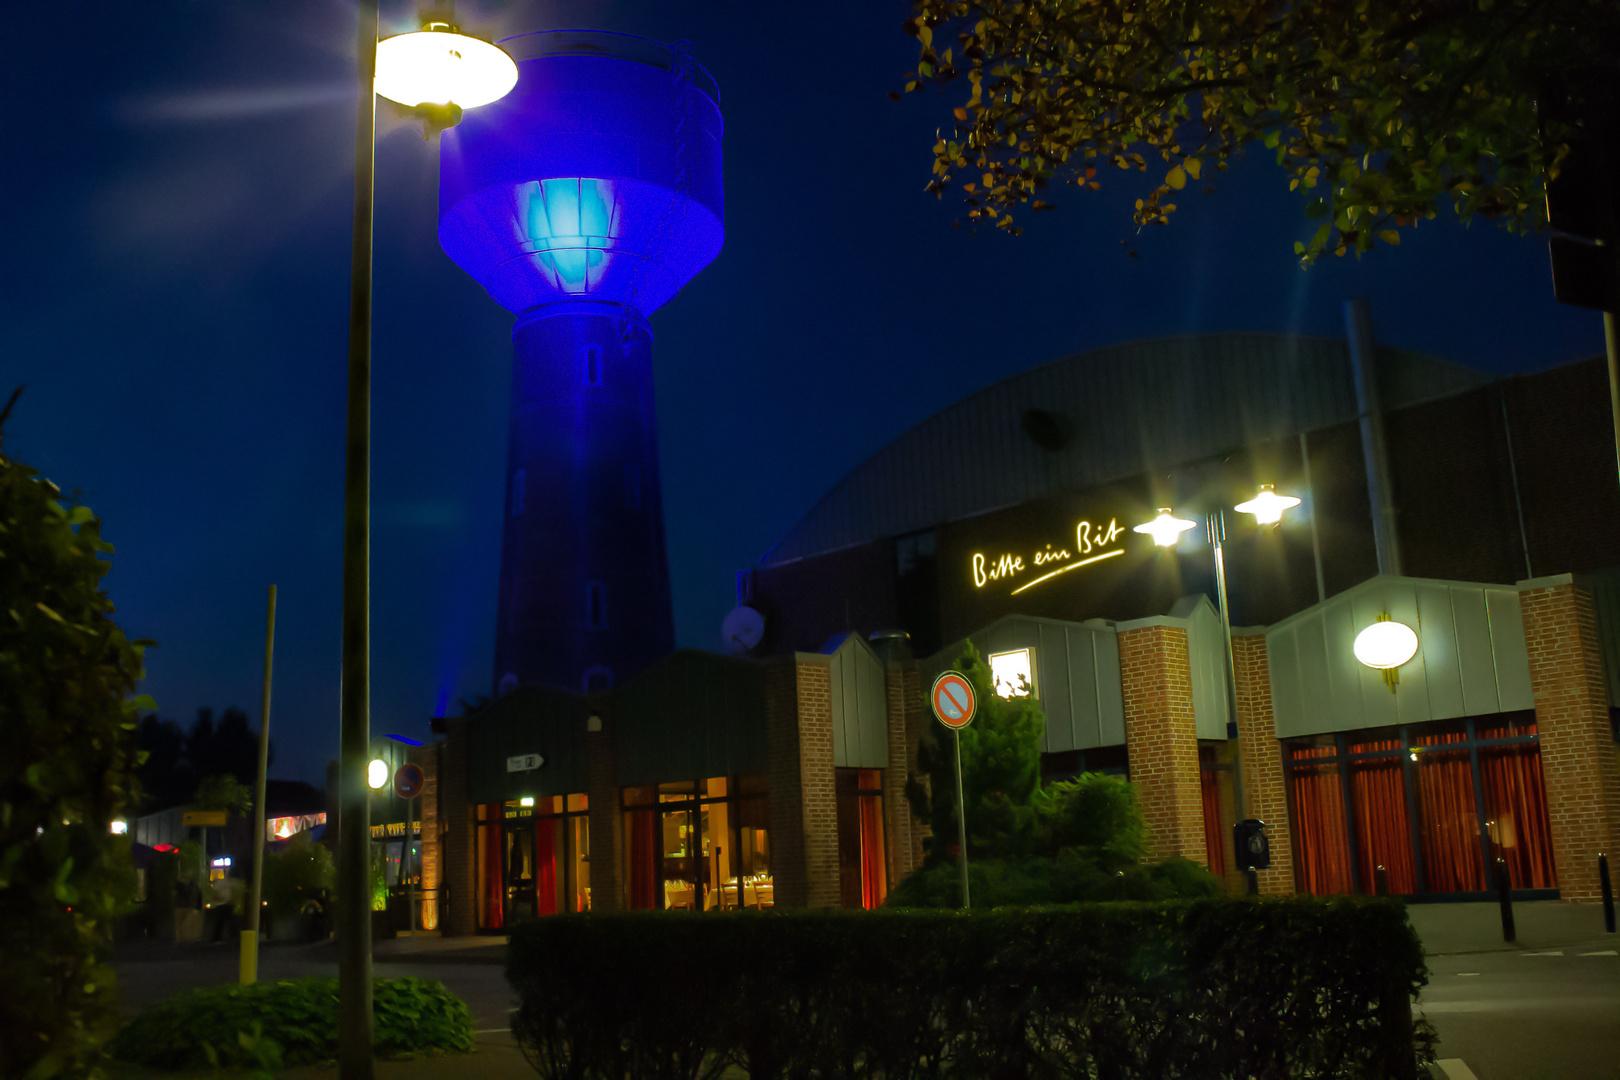 Wasserturm in Alsdorf